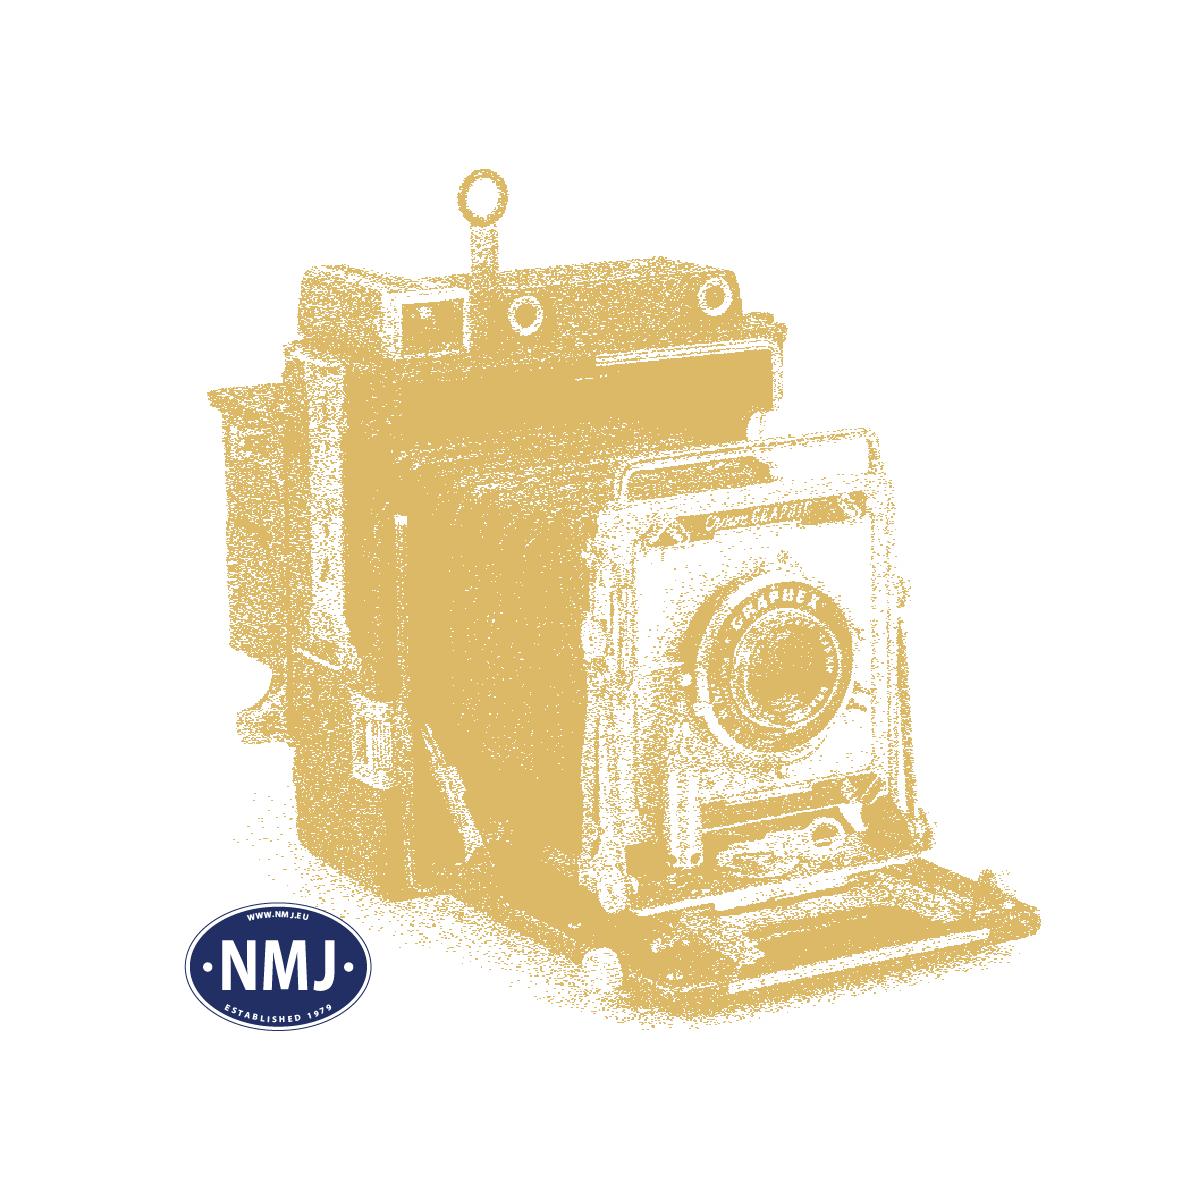 NMJT84.103 - NMJ Topline NSB BM69A.014, DCC m/ Lyd